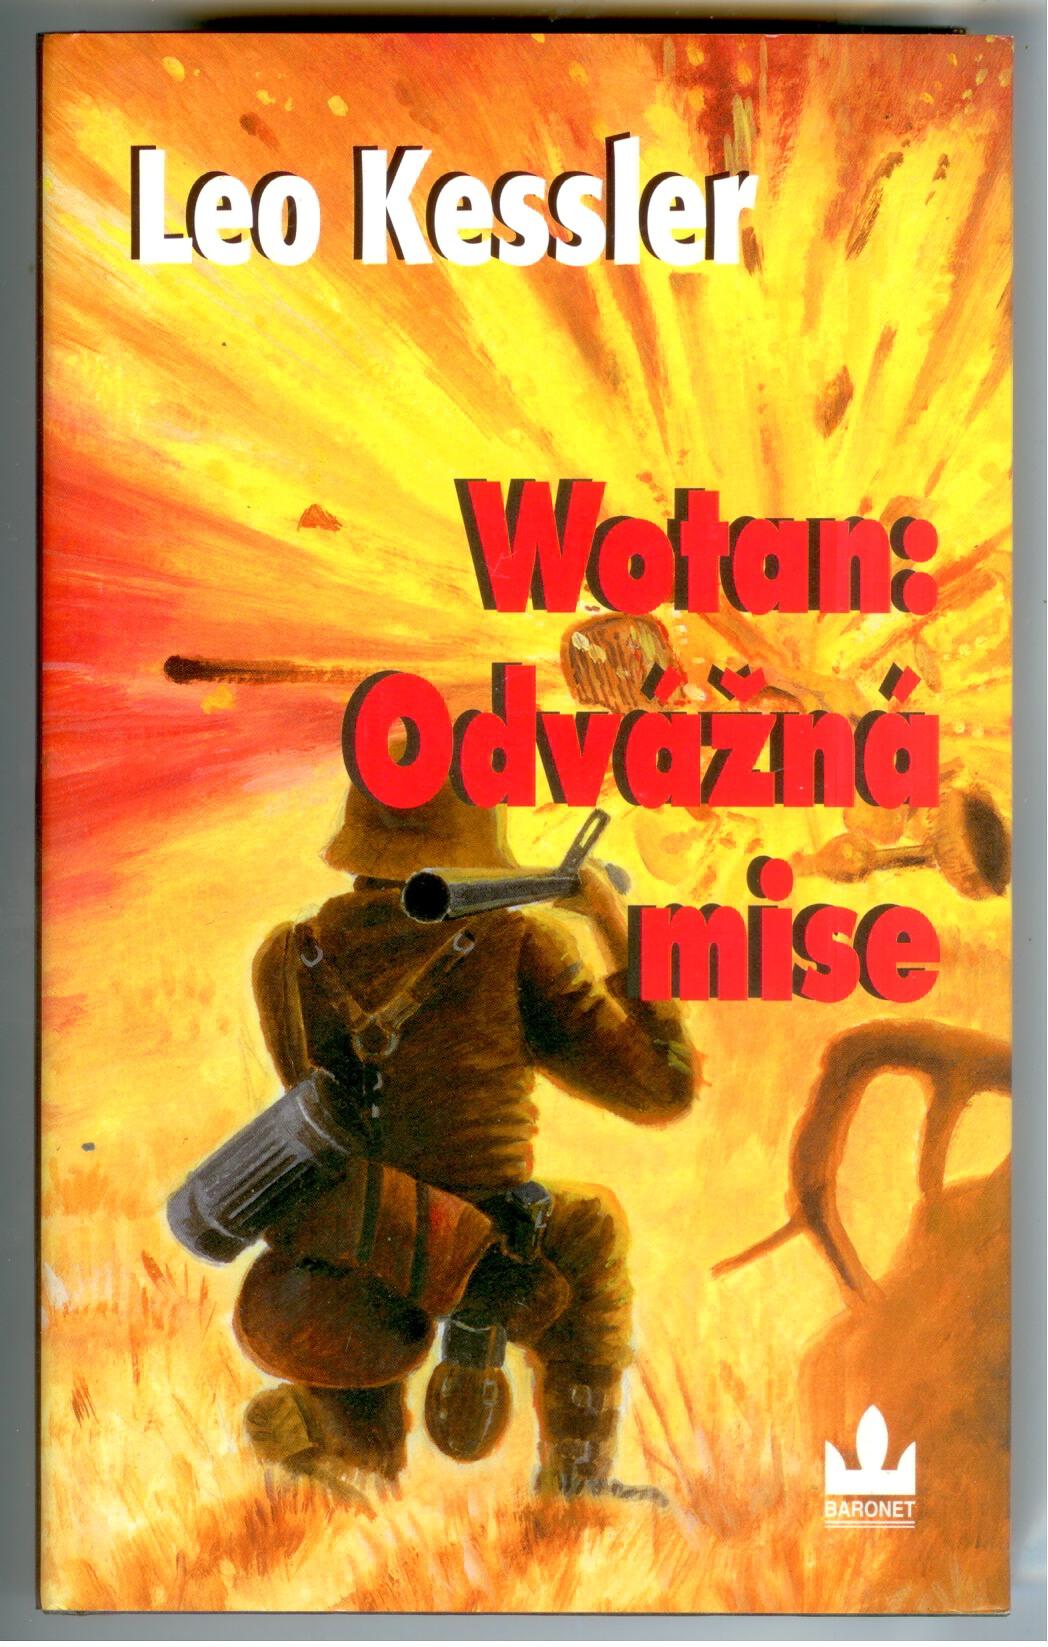 Wotan: Odvážná mise - Leo Kessler